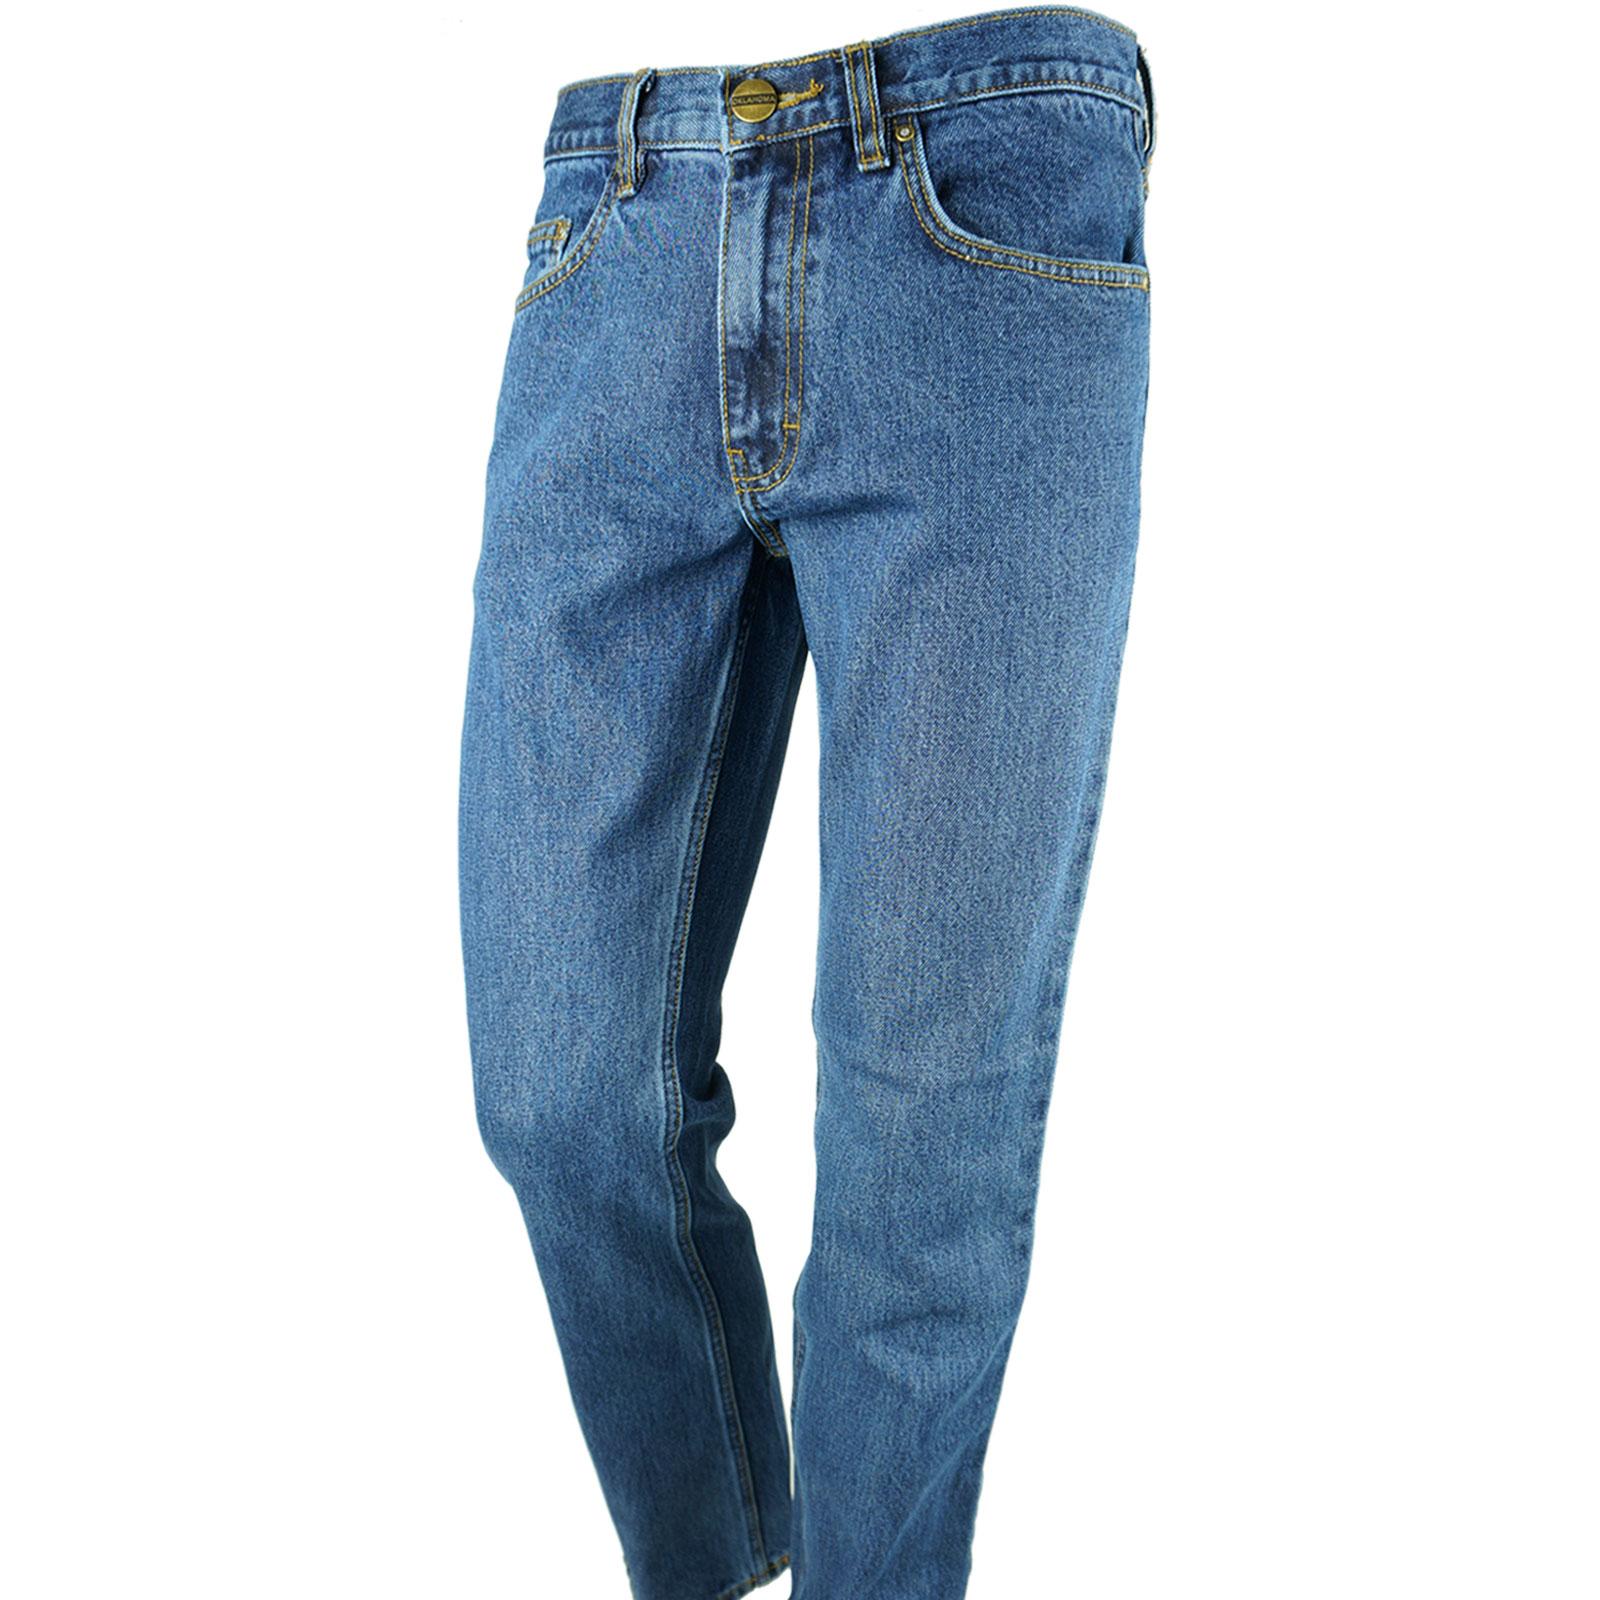 oklahoma herren jeans matrix rocky r 140 stretch gerade. Black Bedroom Furniture Sets. Home Design Ideas